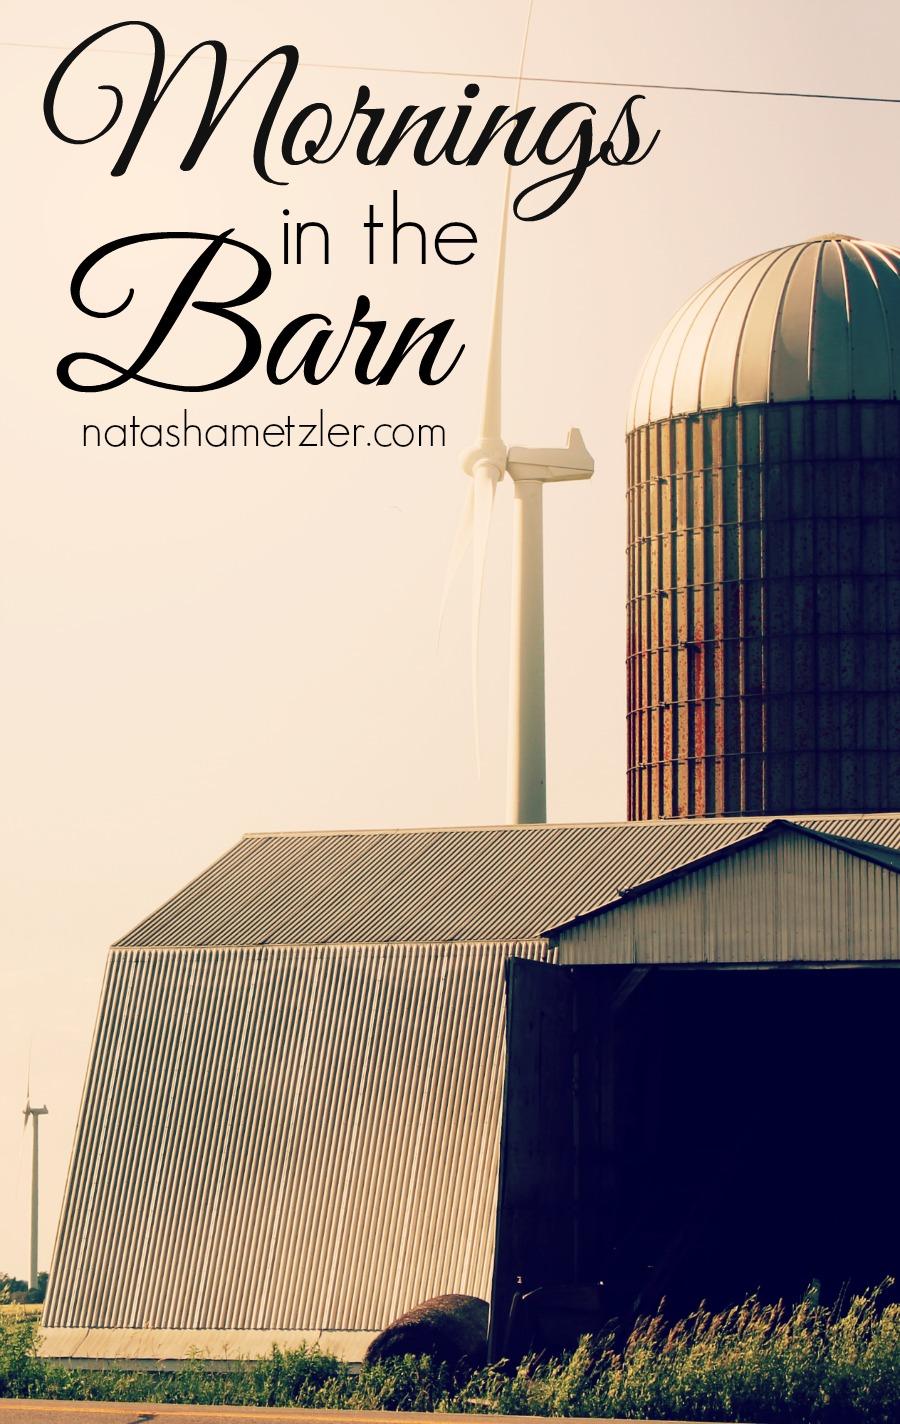 in the barn #farming